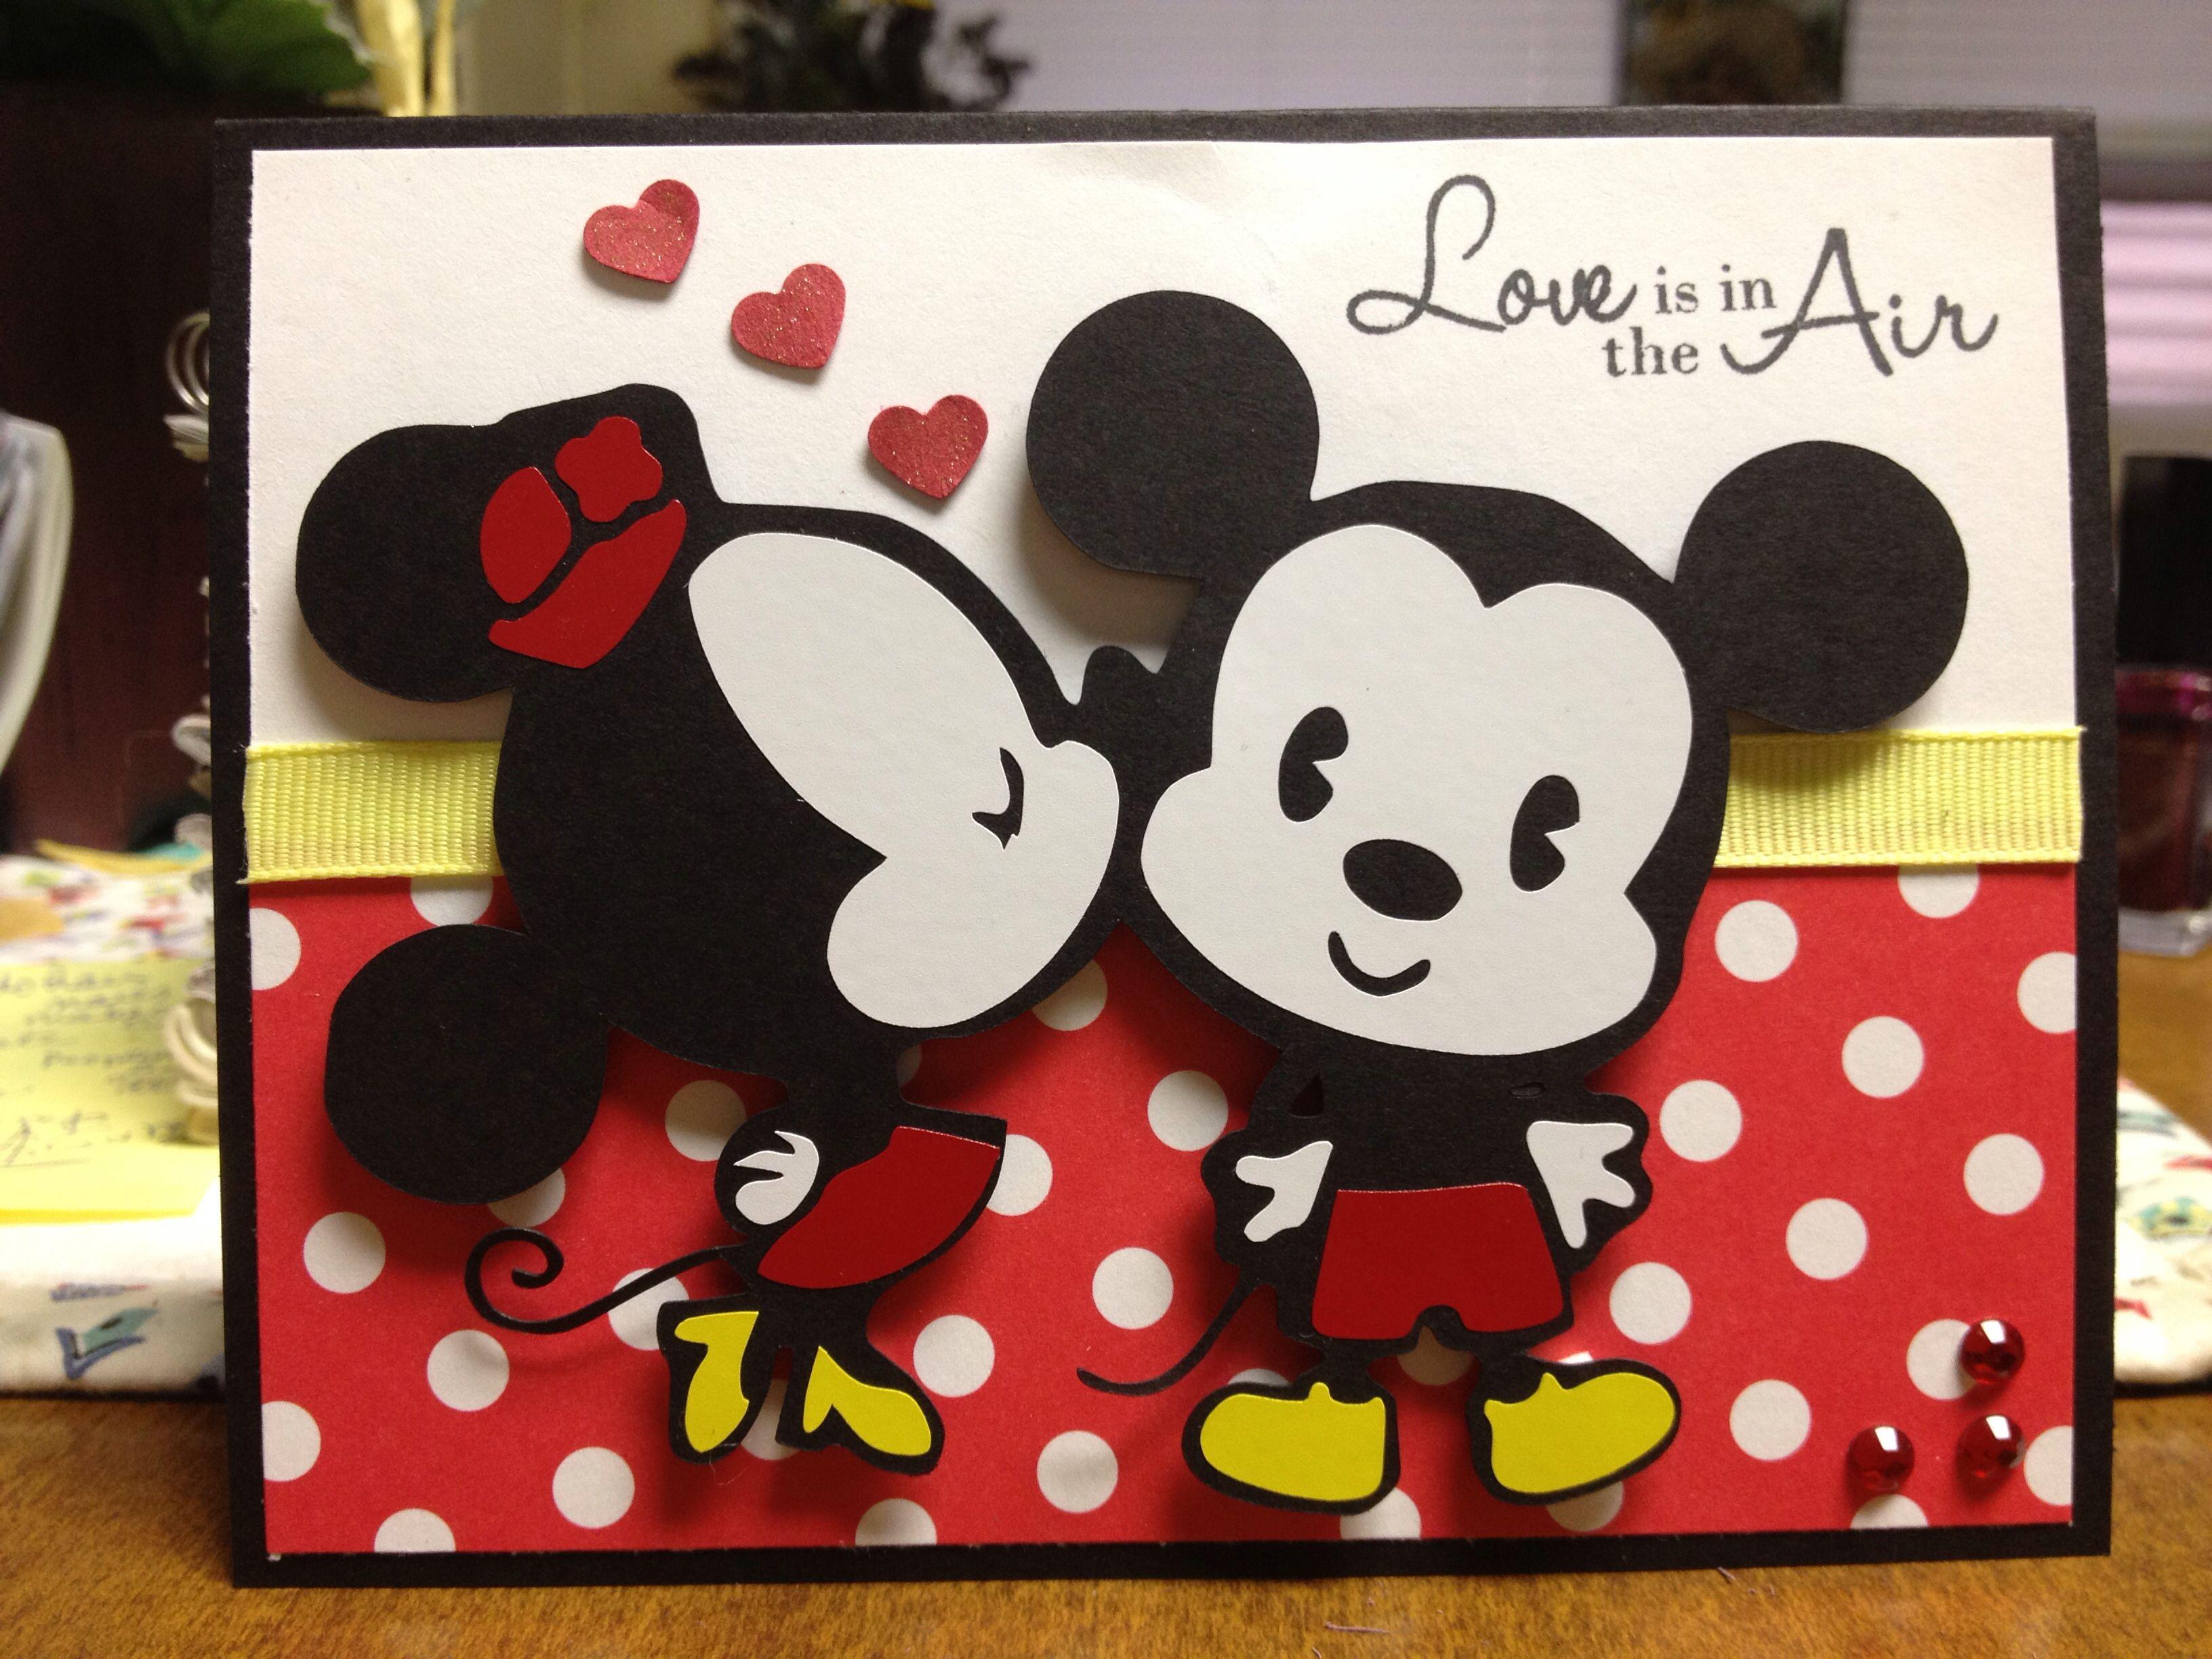 Disney Anniversary Card Anniversary Cards Handmade Diy Anniversary Cards For Parents Diy Disney Cards